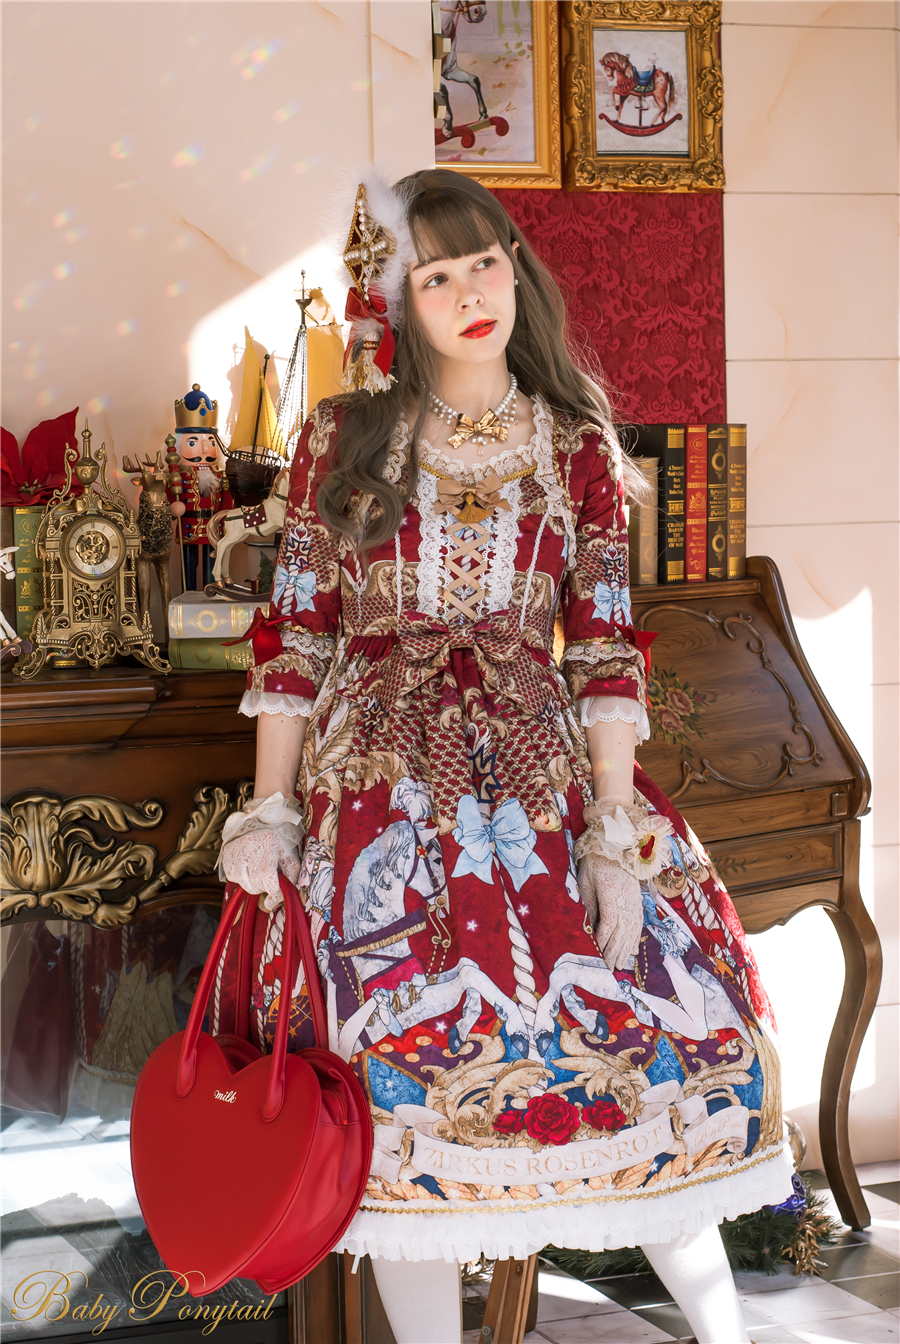 Baby Ponytail_Circus Princess_Red OP_Claudia_07.jpg